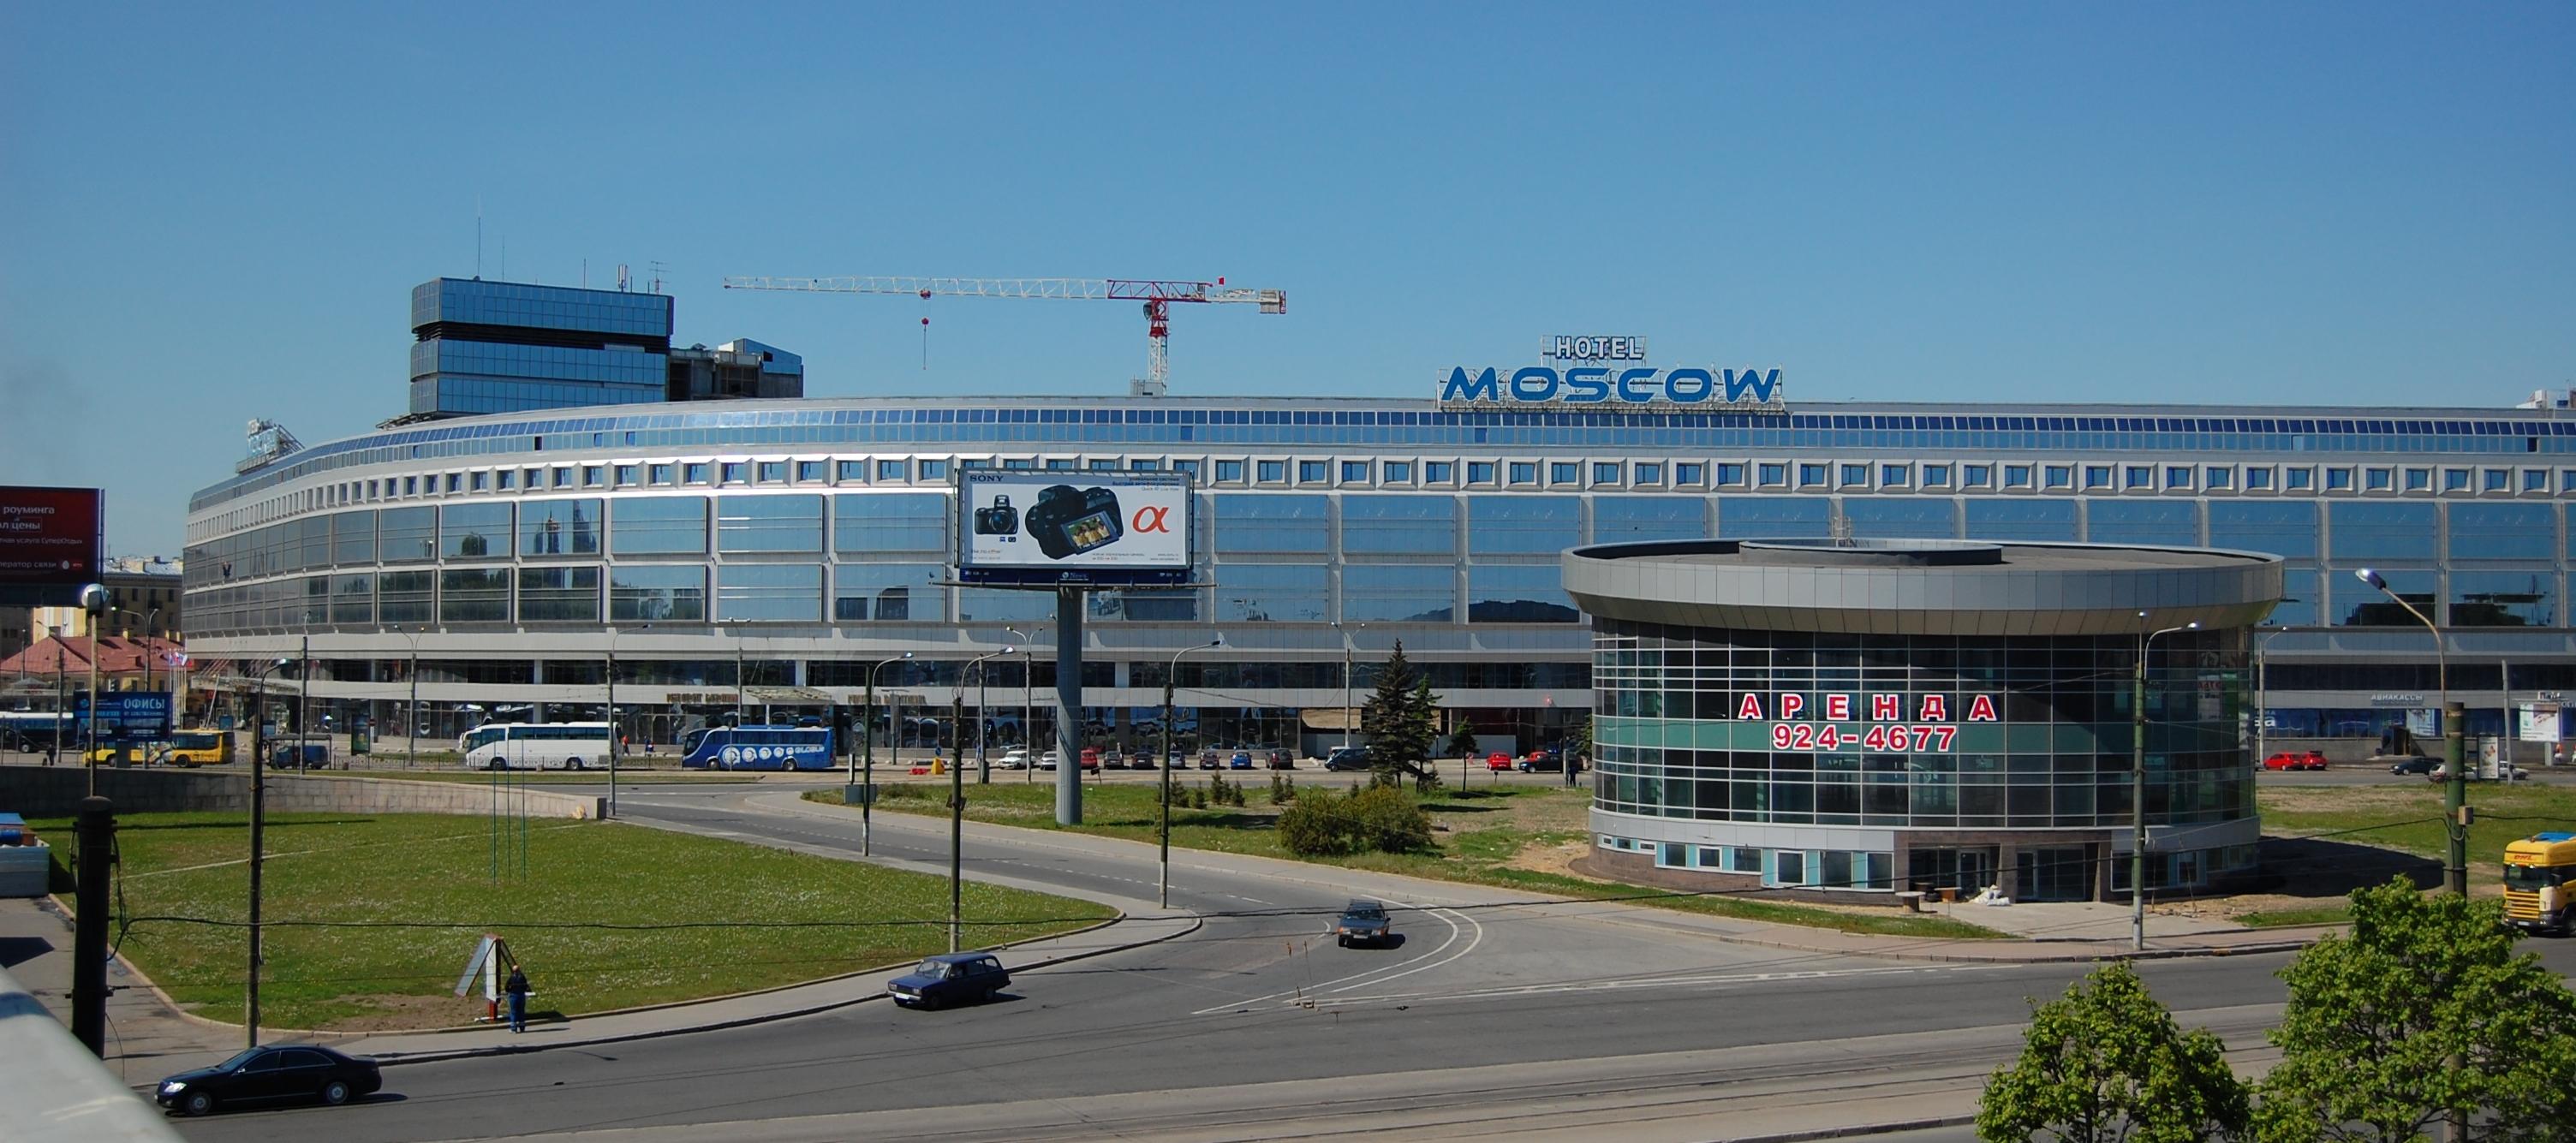 гостиница москва санкт петербург фото